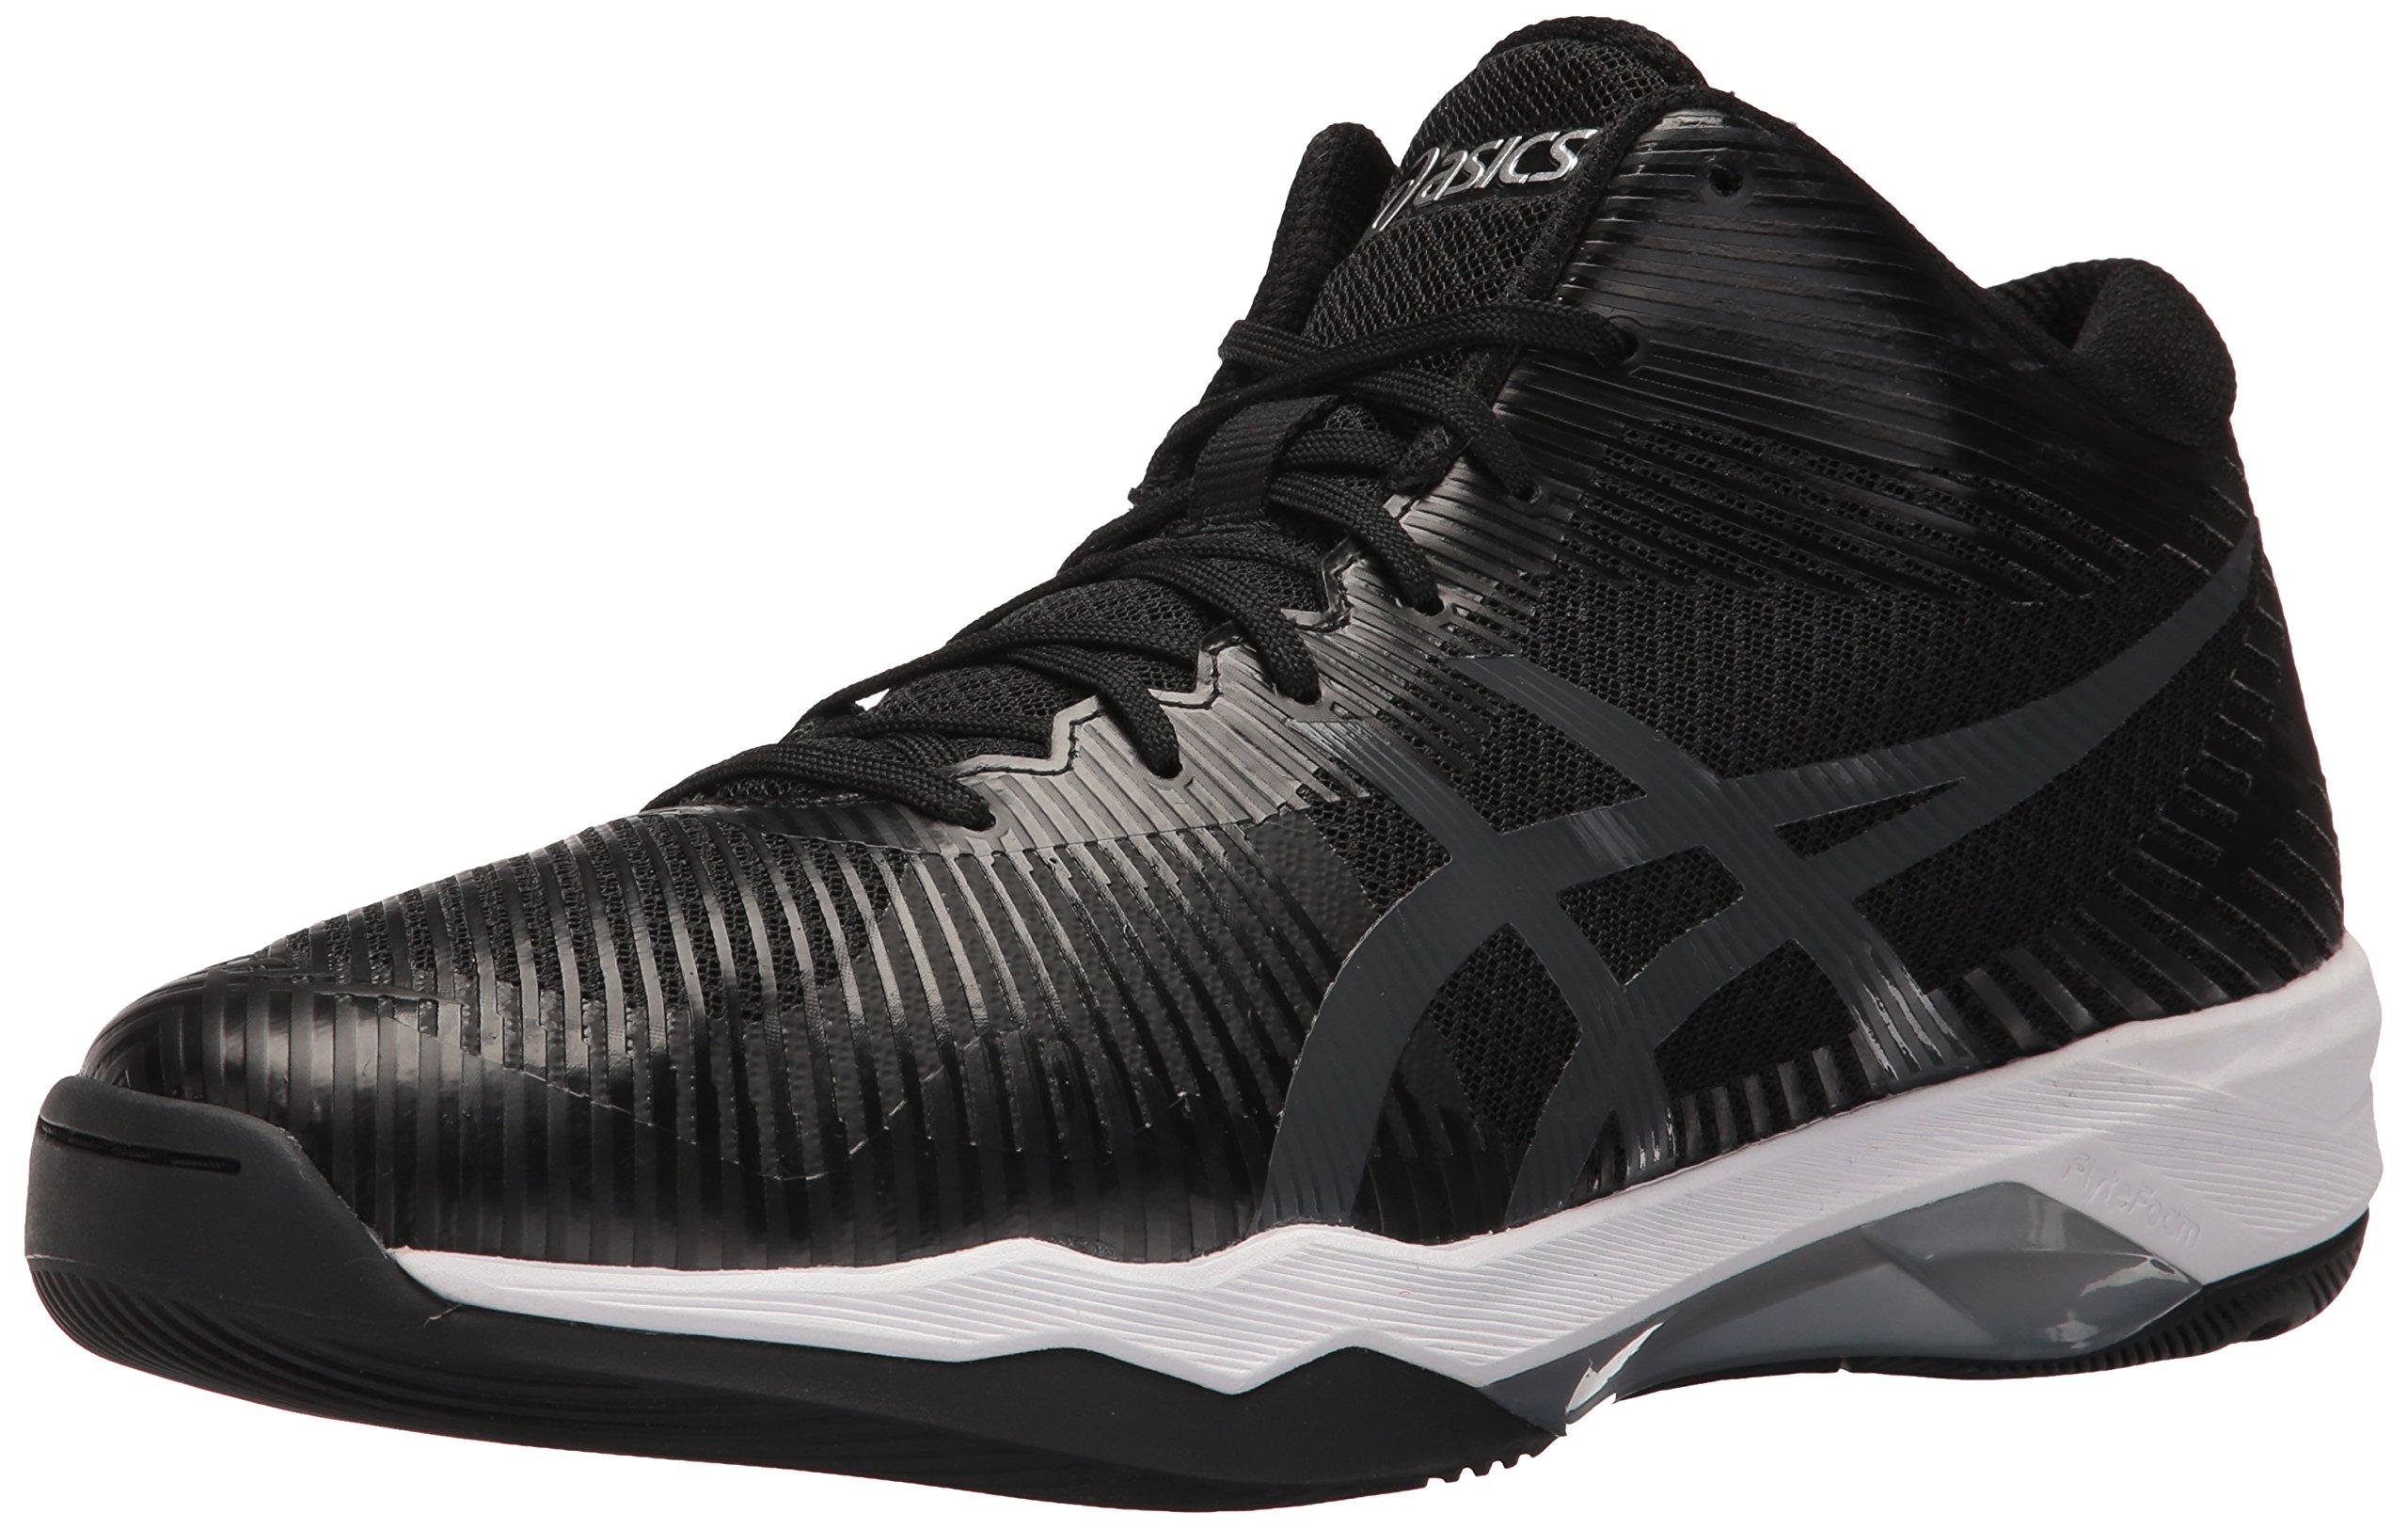 ASICS Mens Volley Elite FF MT Volleyball Shoe, Black/Dark Grey/White, 10 Medium US by ASICS